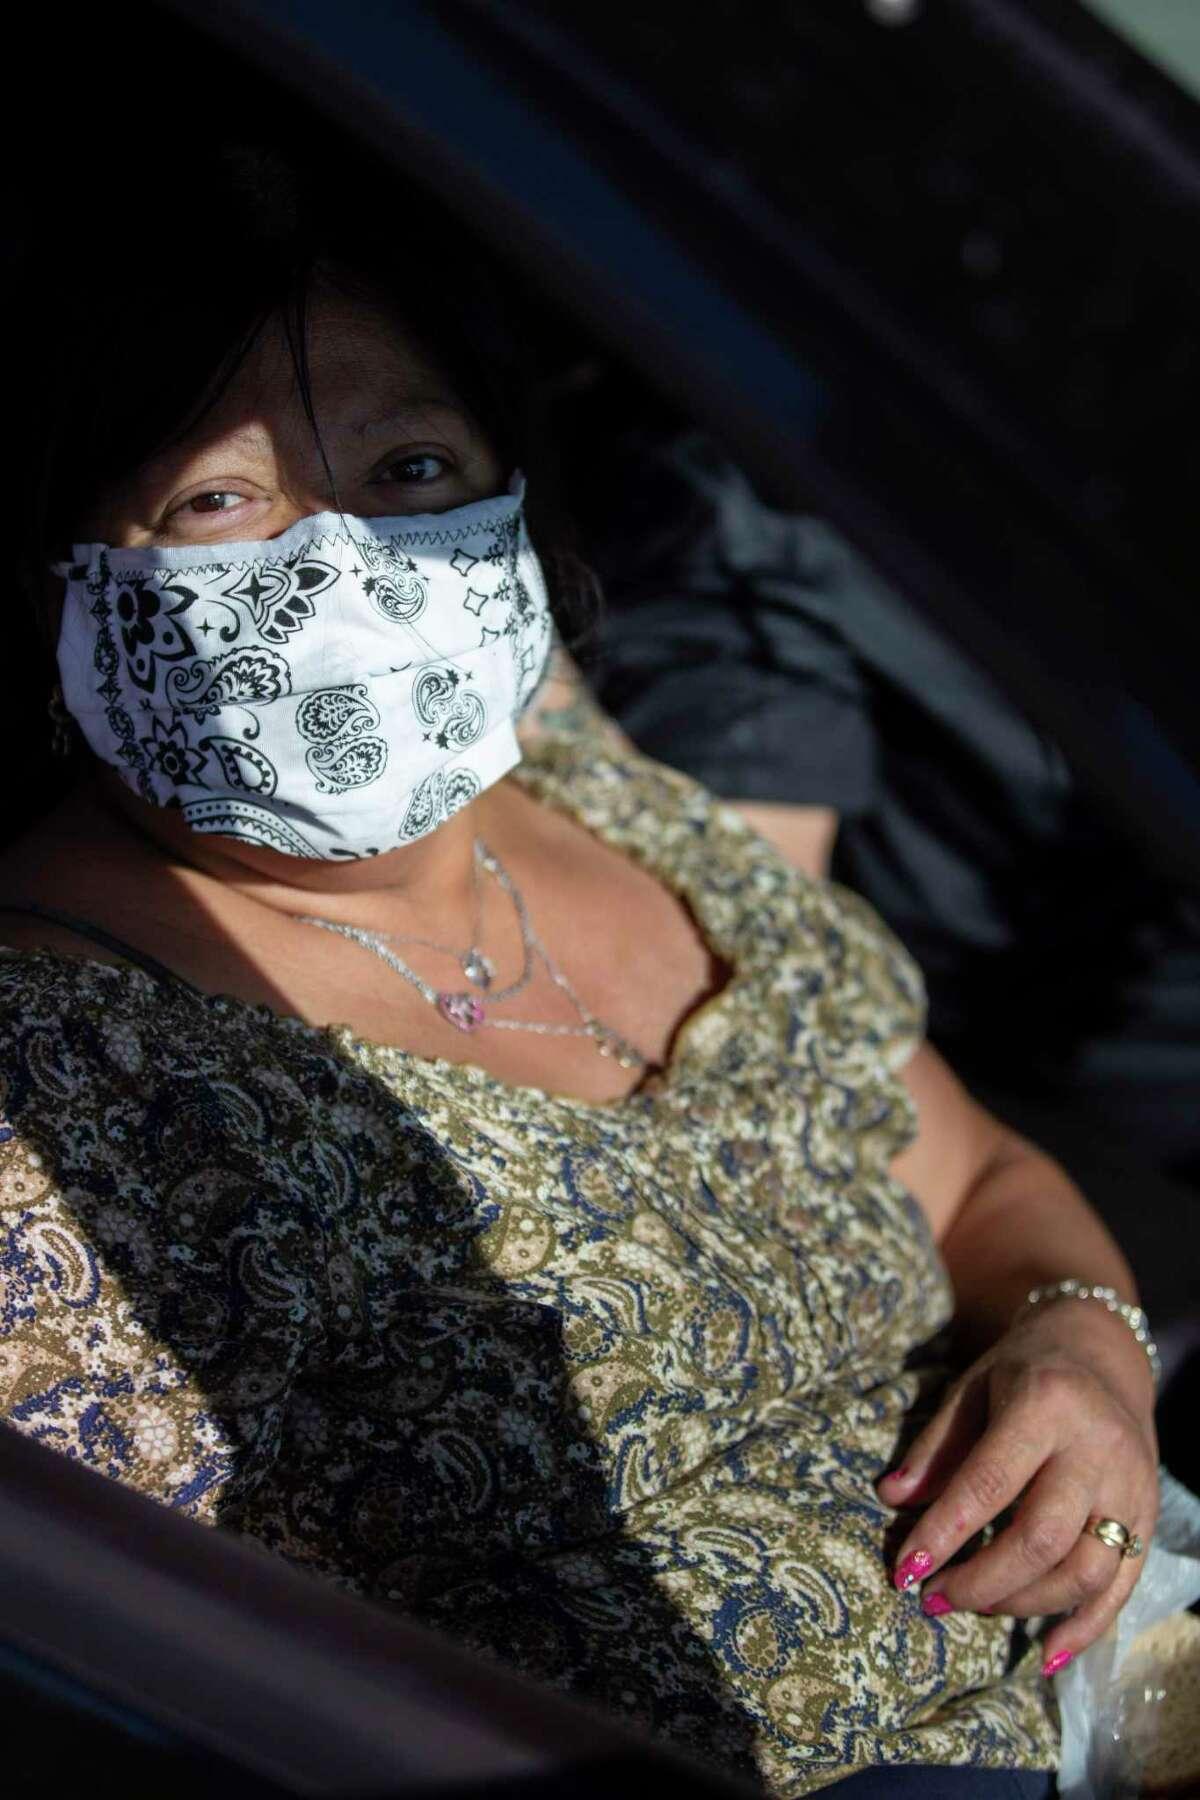 Anita Rodriguez poses wearing her mask in her car before the April 24, 2020 San Antonio Food Bank drive thru food distribution at Toyota Field in San Antonio, Texas.